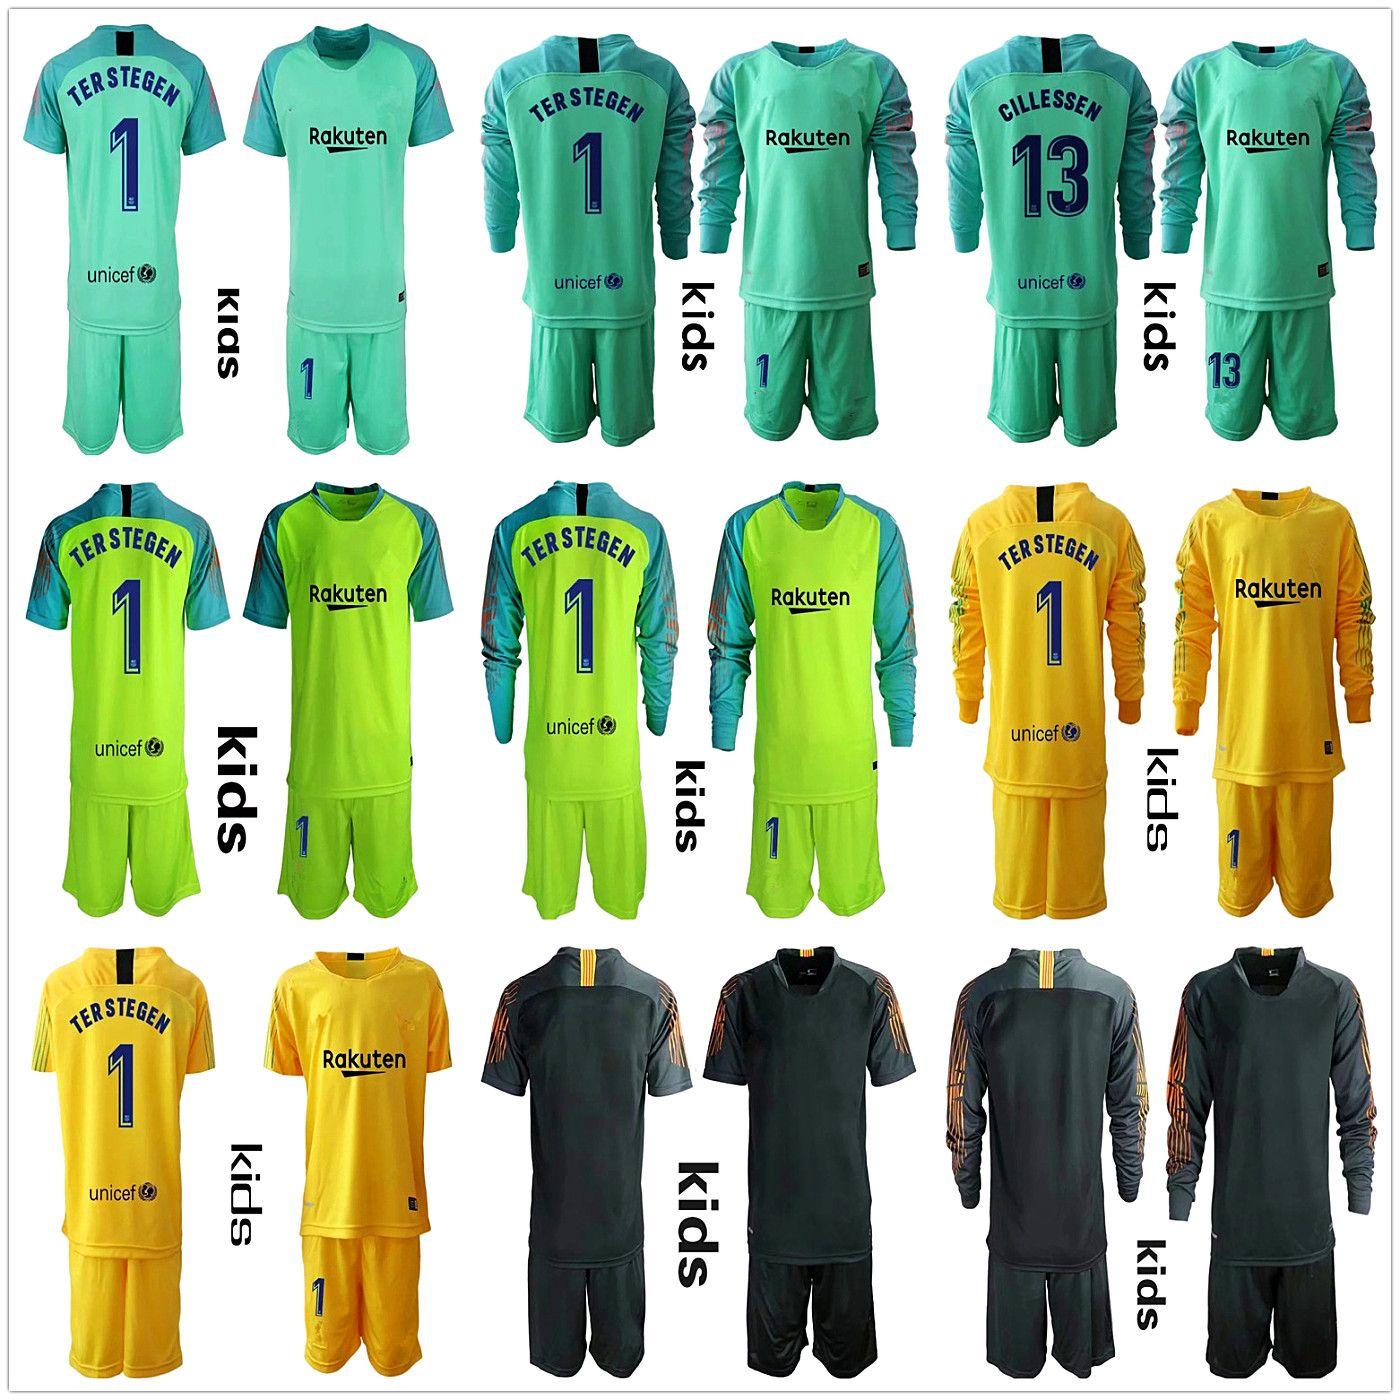 new product 5677f daa95 2018 2019 Youth Long Ter Stegen Goalkeeper Jerseys Kids Kit Soccer Sets #1  Ter Stegen Kid Boy Goalkeeper Jersey Children Uniform Sets